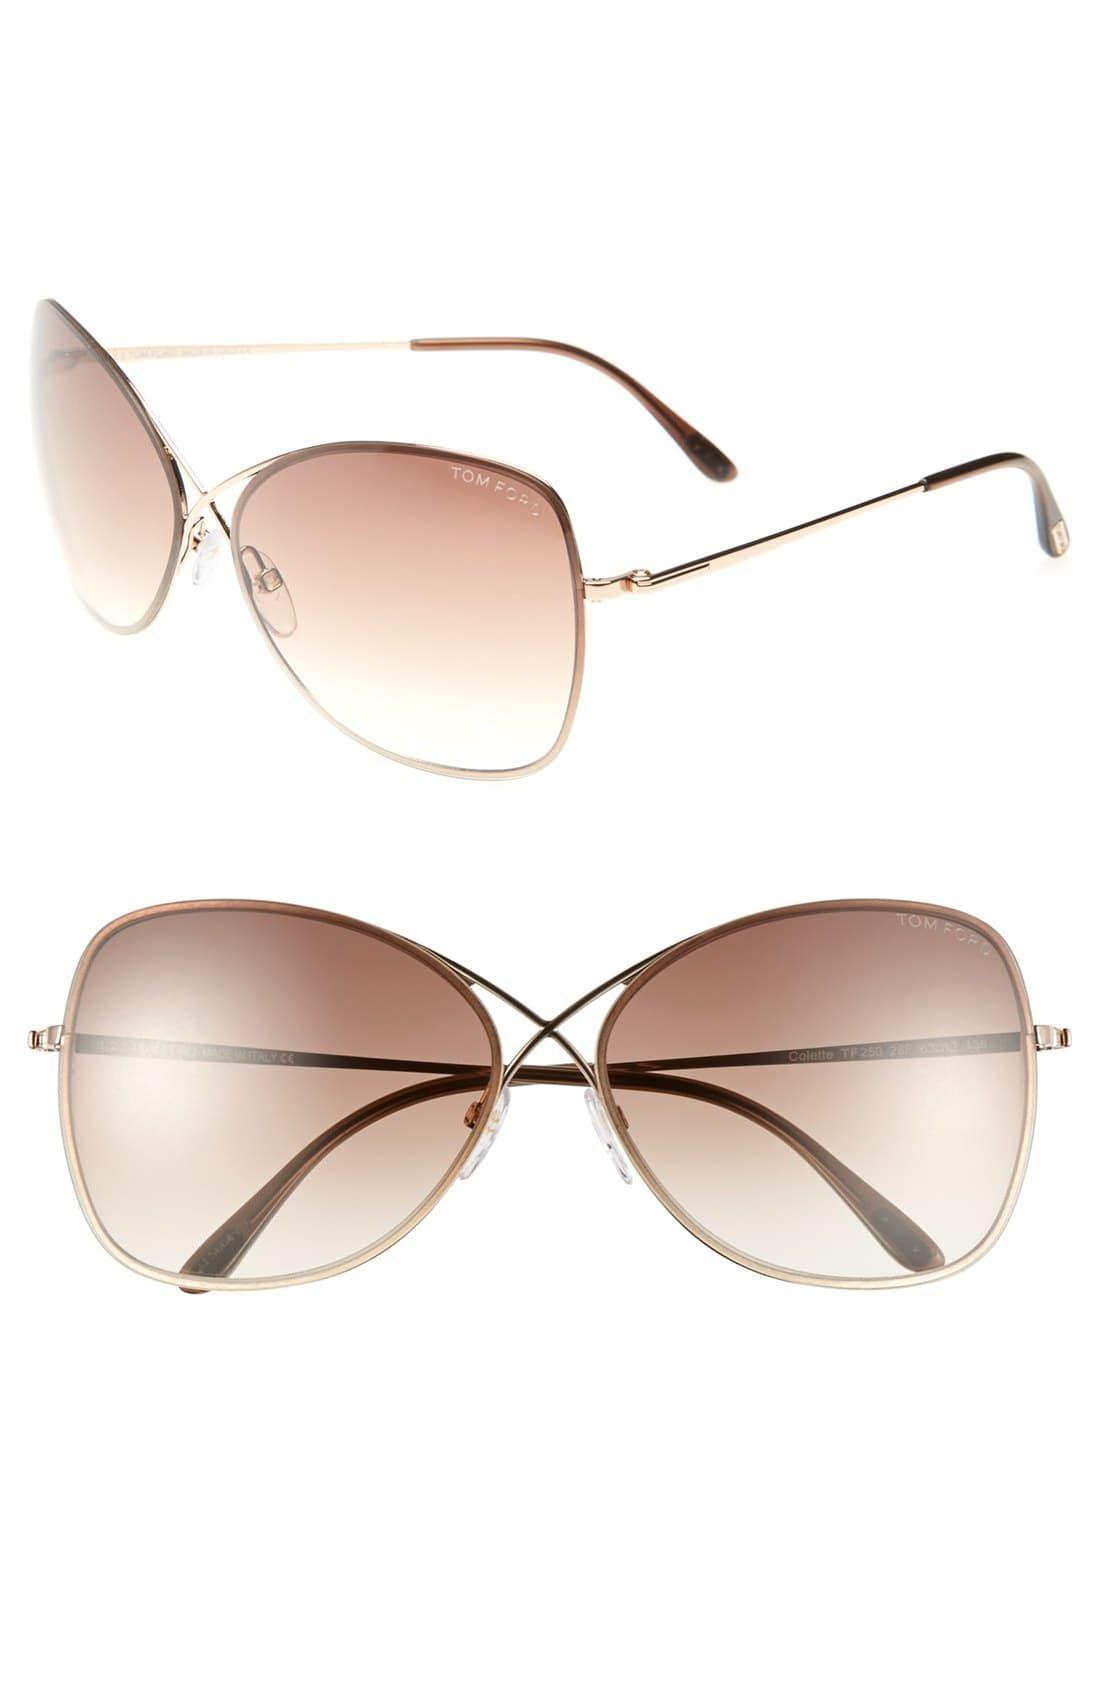 Tom Ford Colette 63mm Oversize Sunglasses